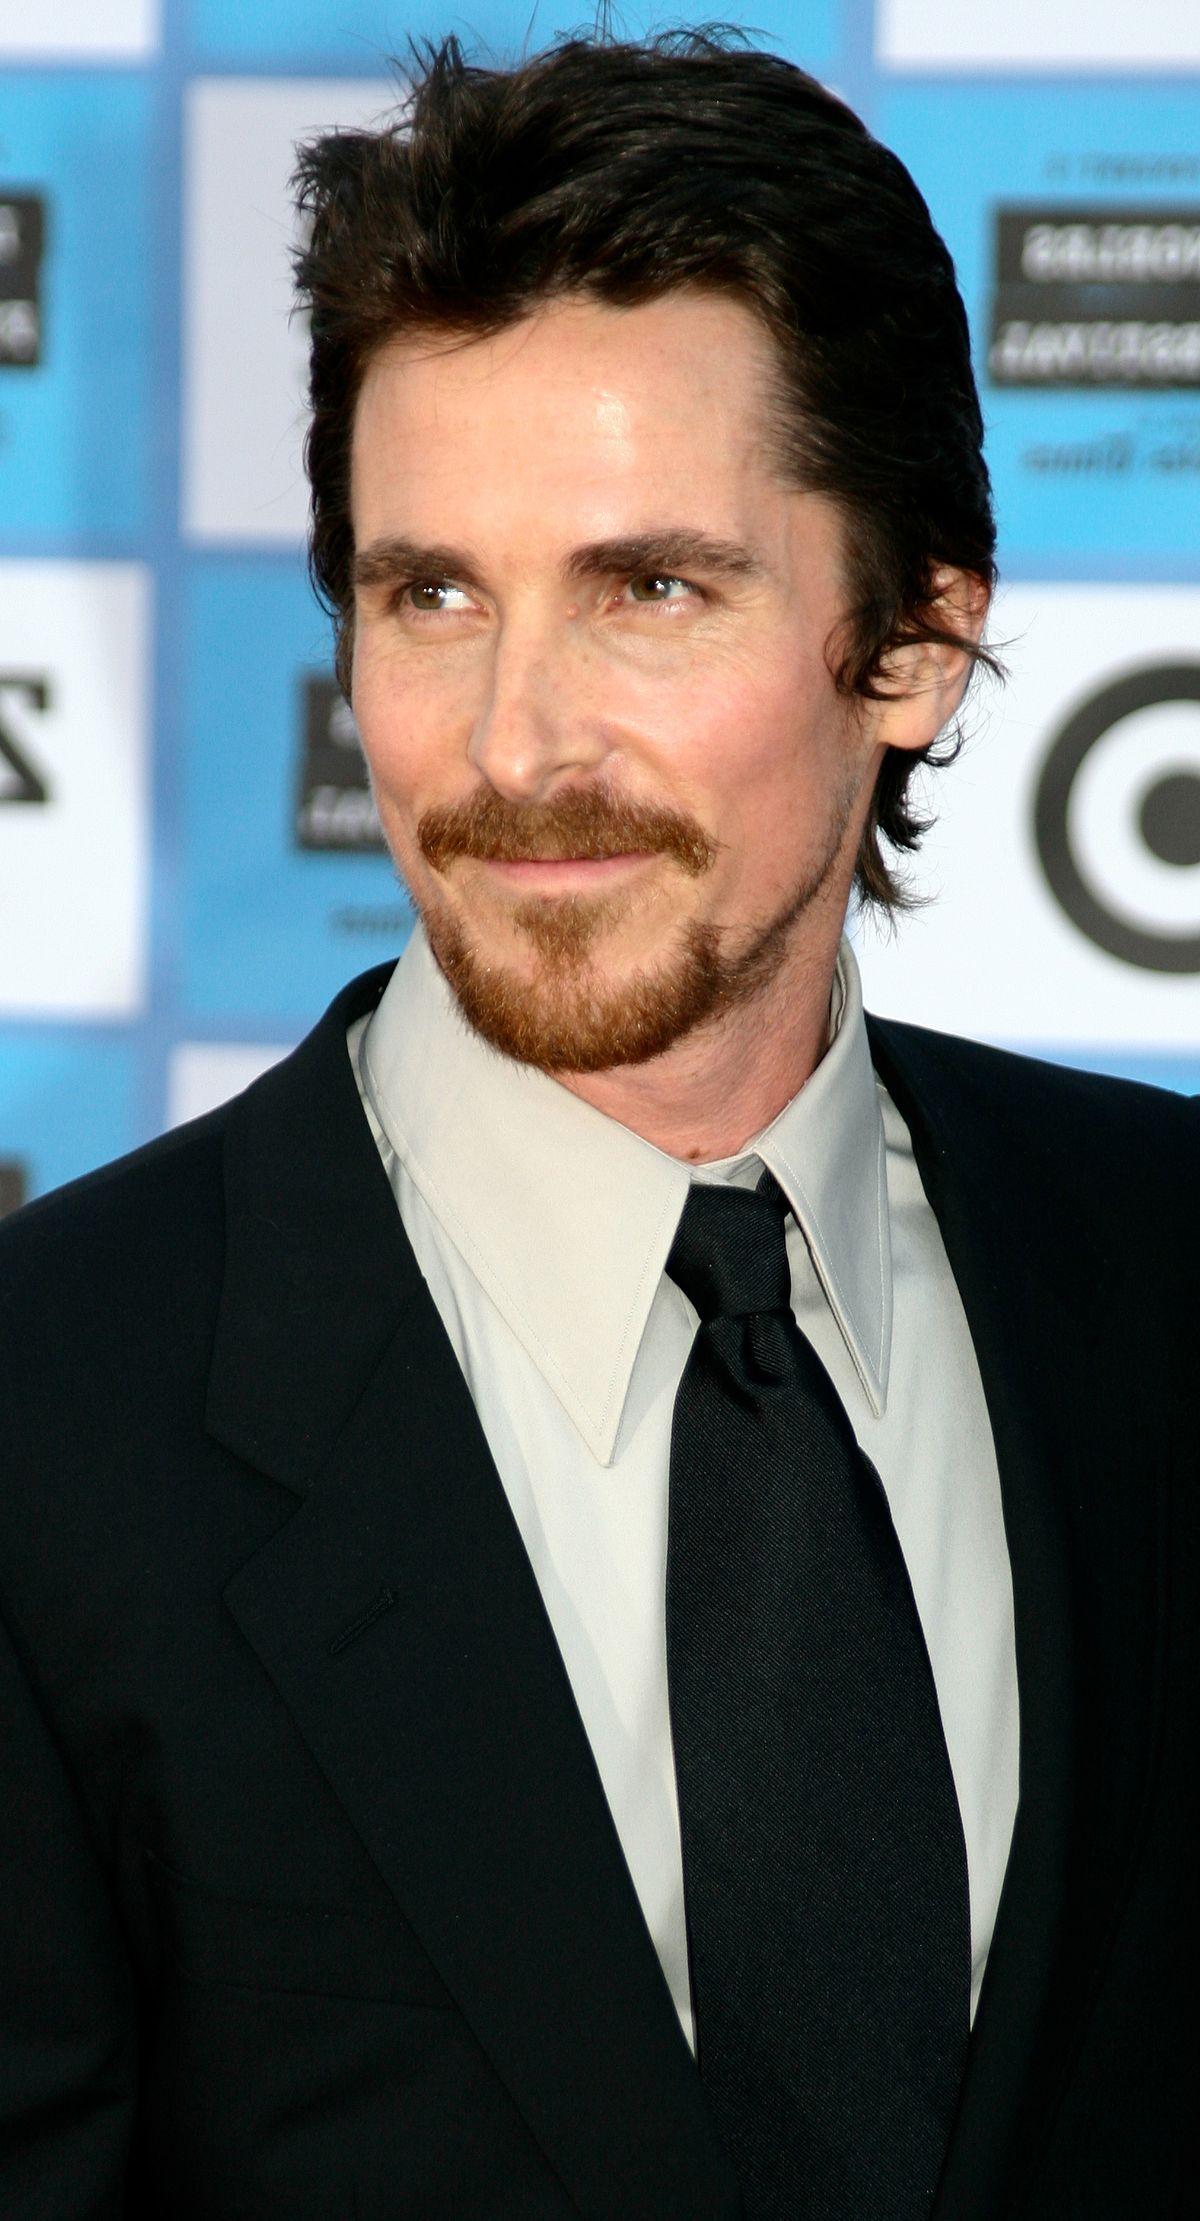 Christian Bale – Wikipédia Christian Bale